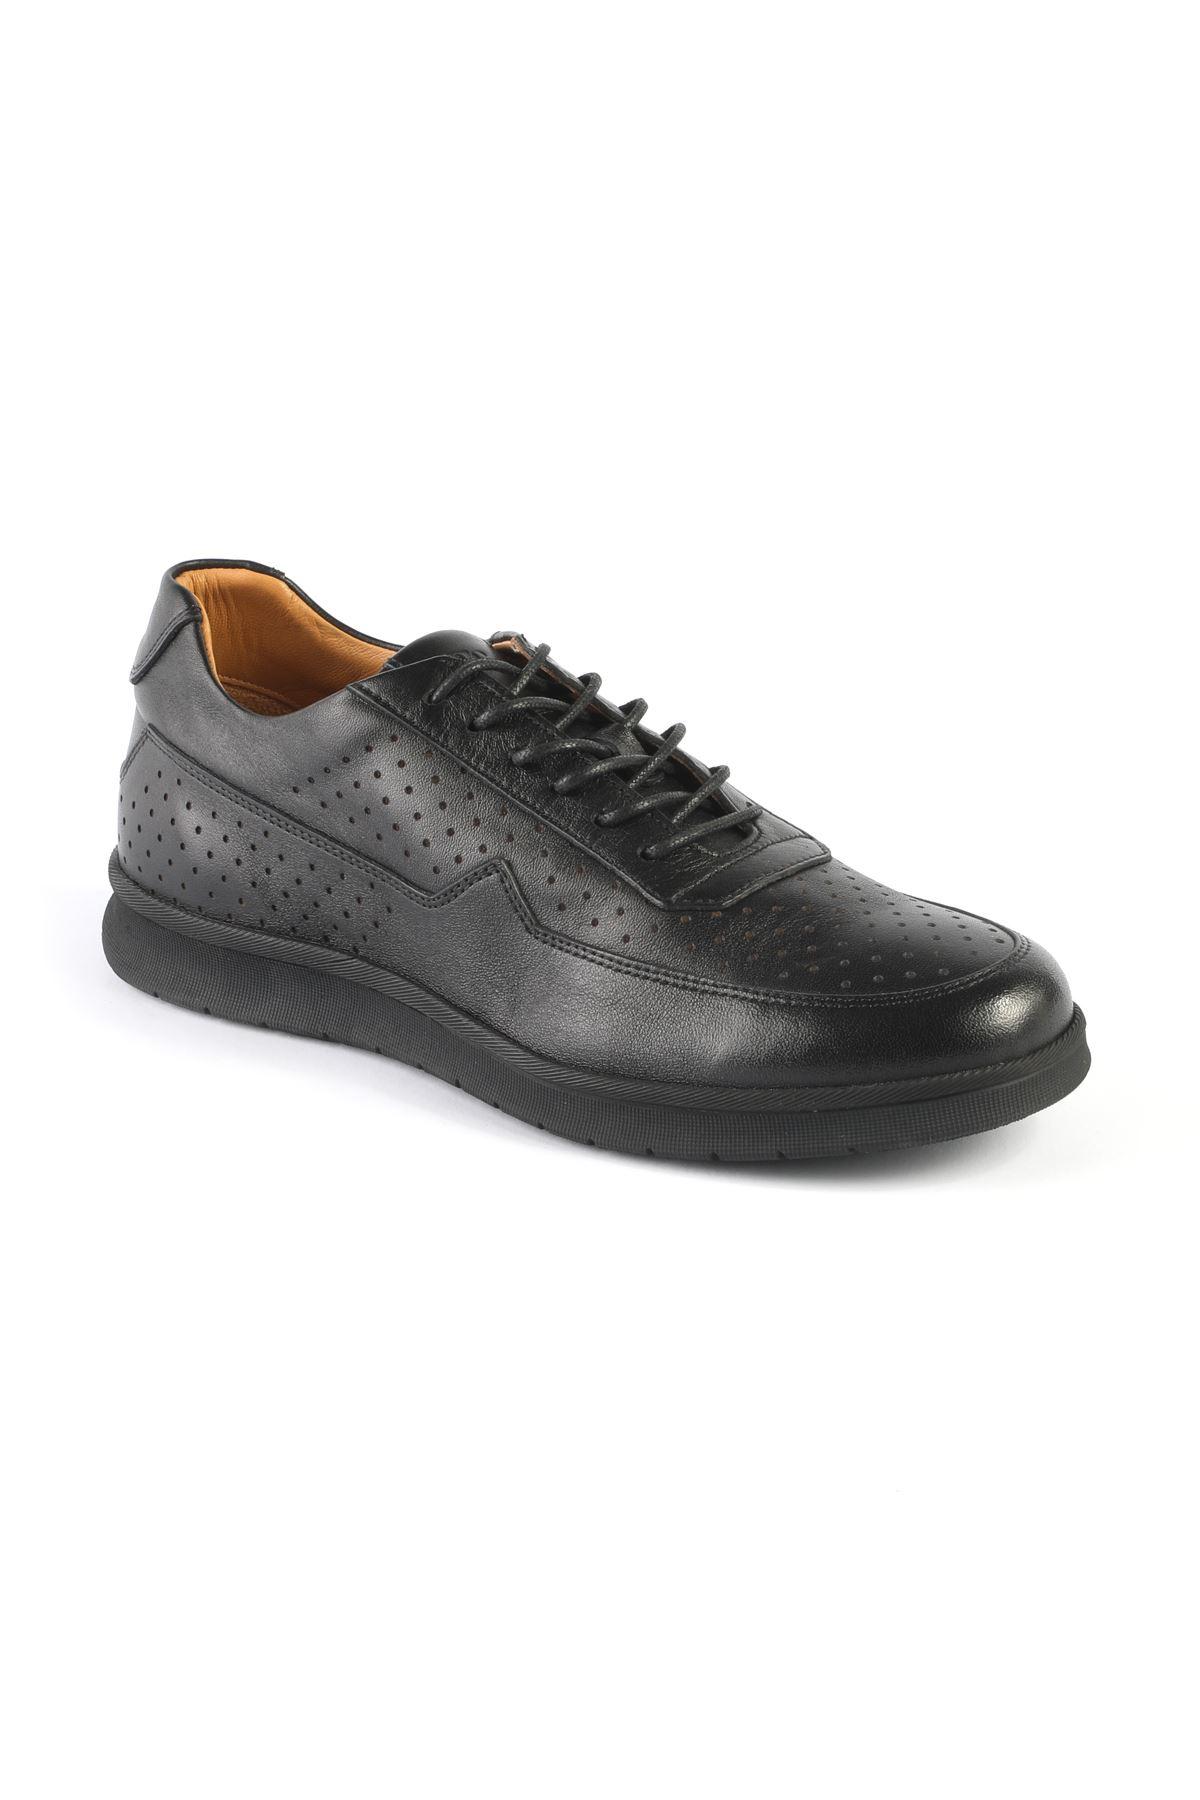 Libero 3241 Black Sports Shoes